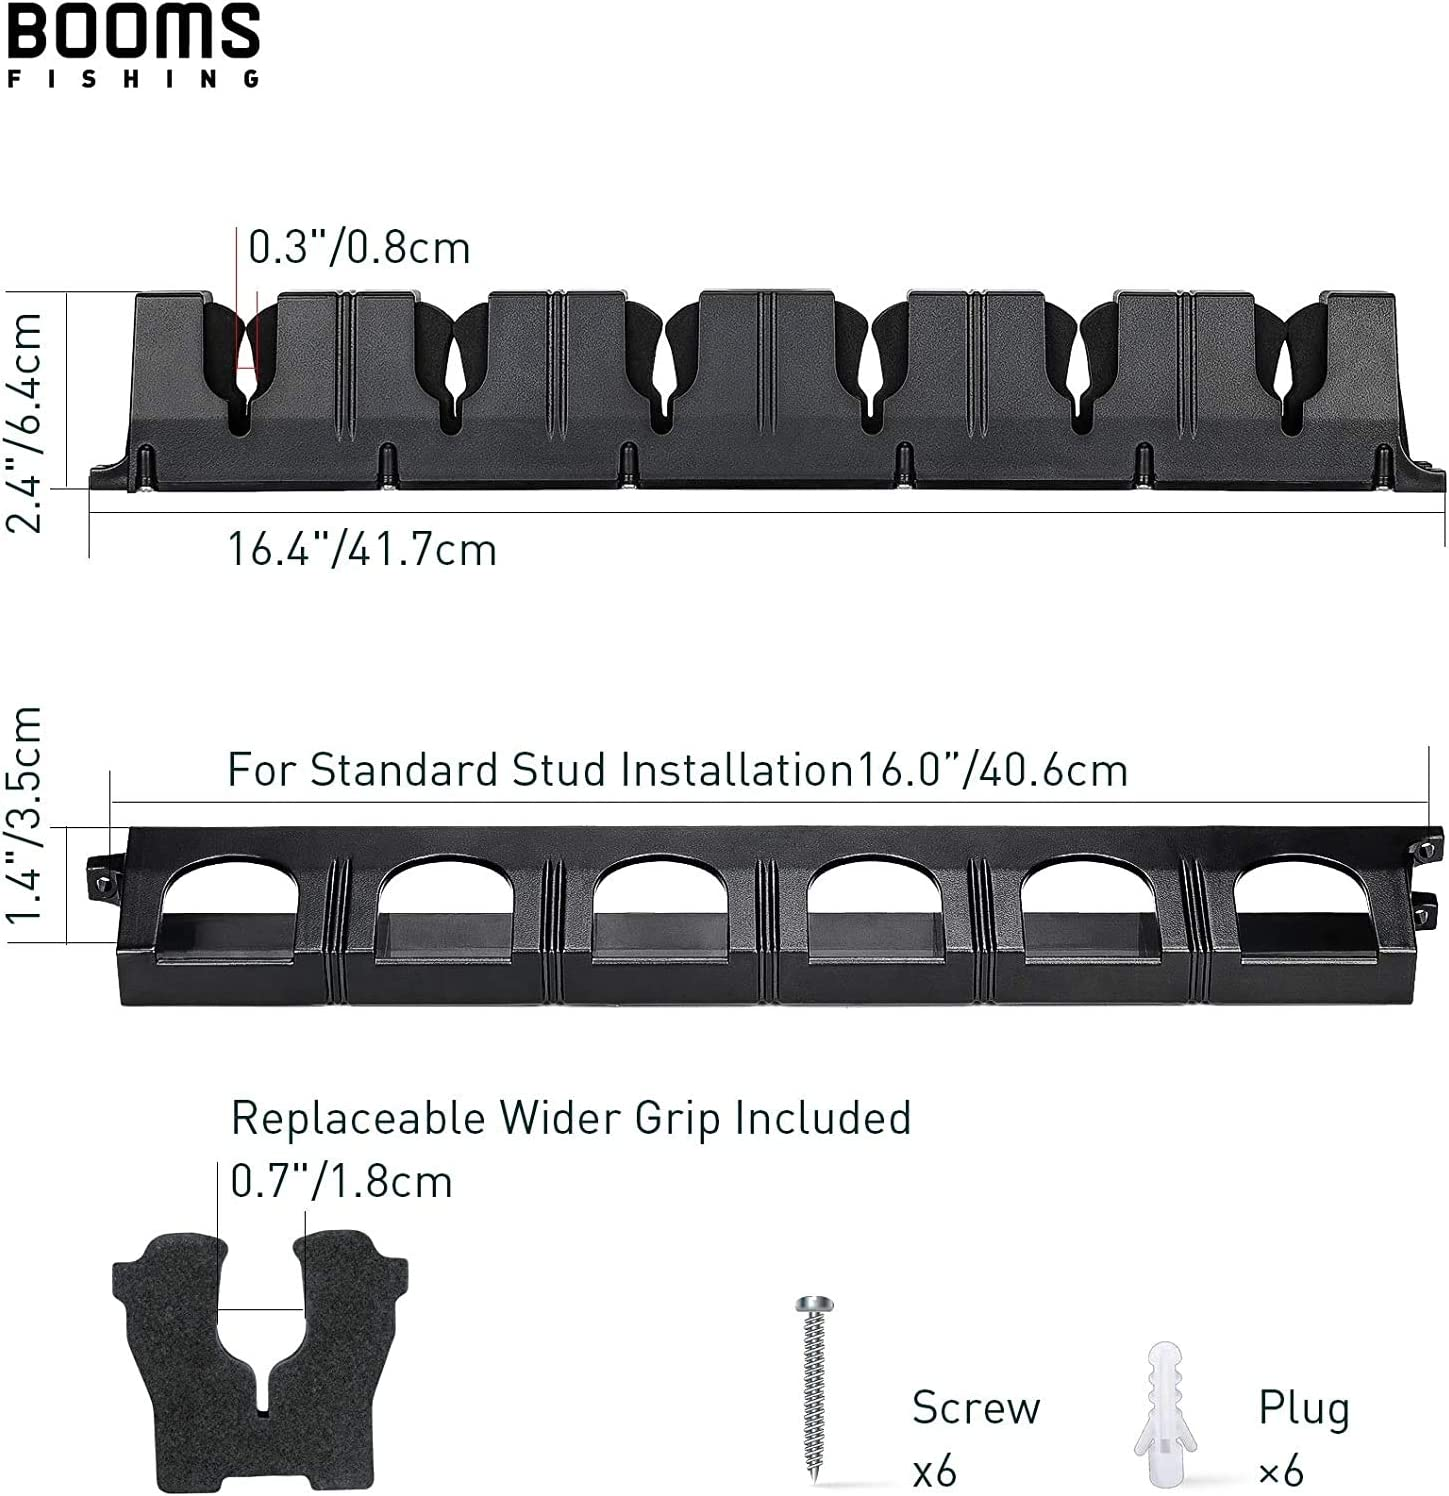 Booms Fishing WV2 Vertical 6-Rod Rack Horizontal Fishing Pole Holder Wall Mount Modular for Garage